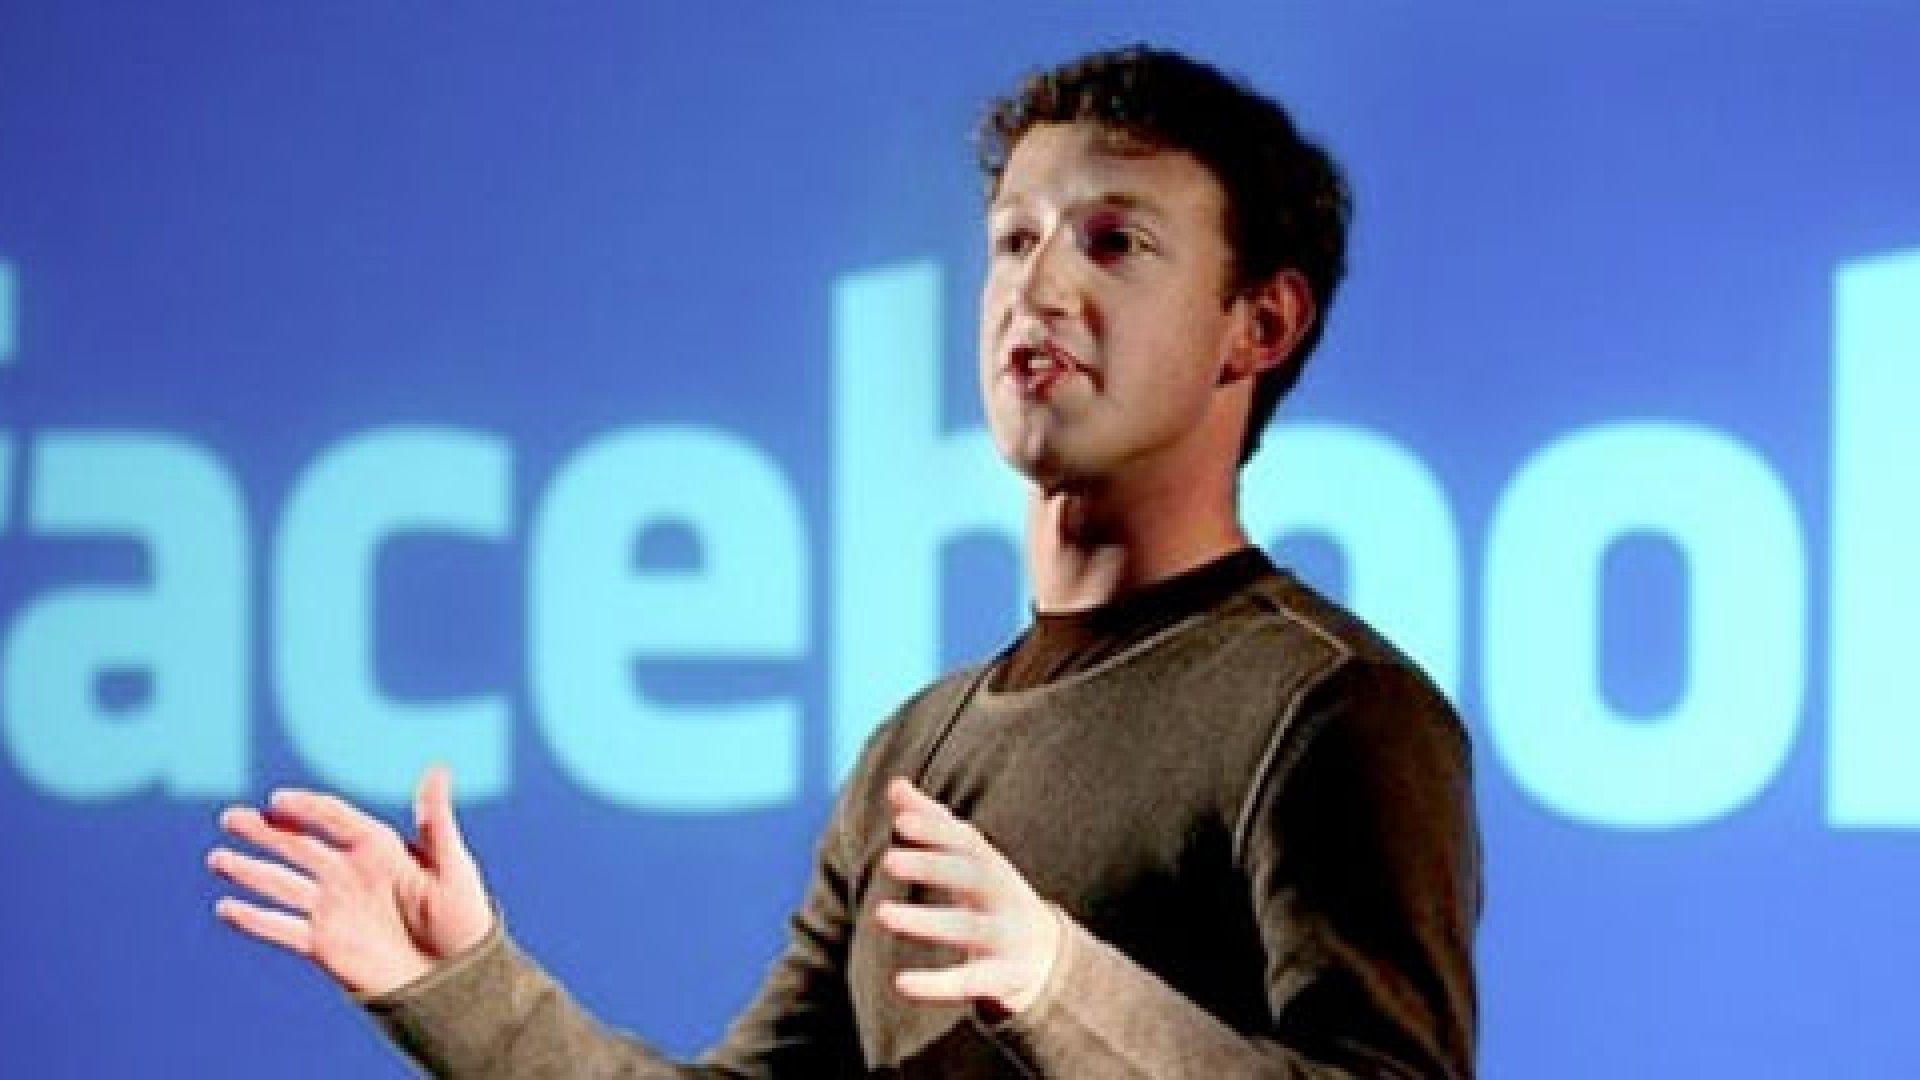 Facebook Revenue: $1.18 Billion